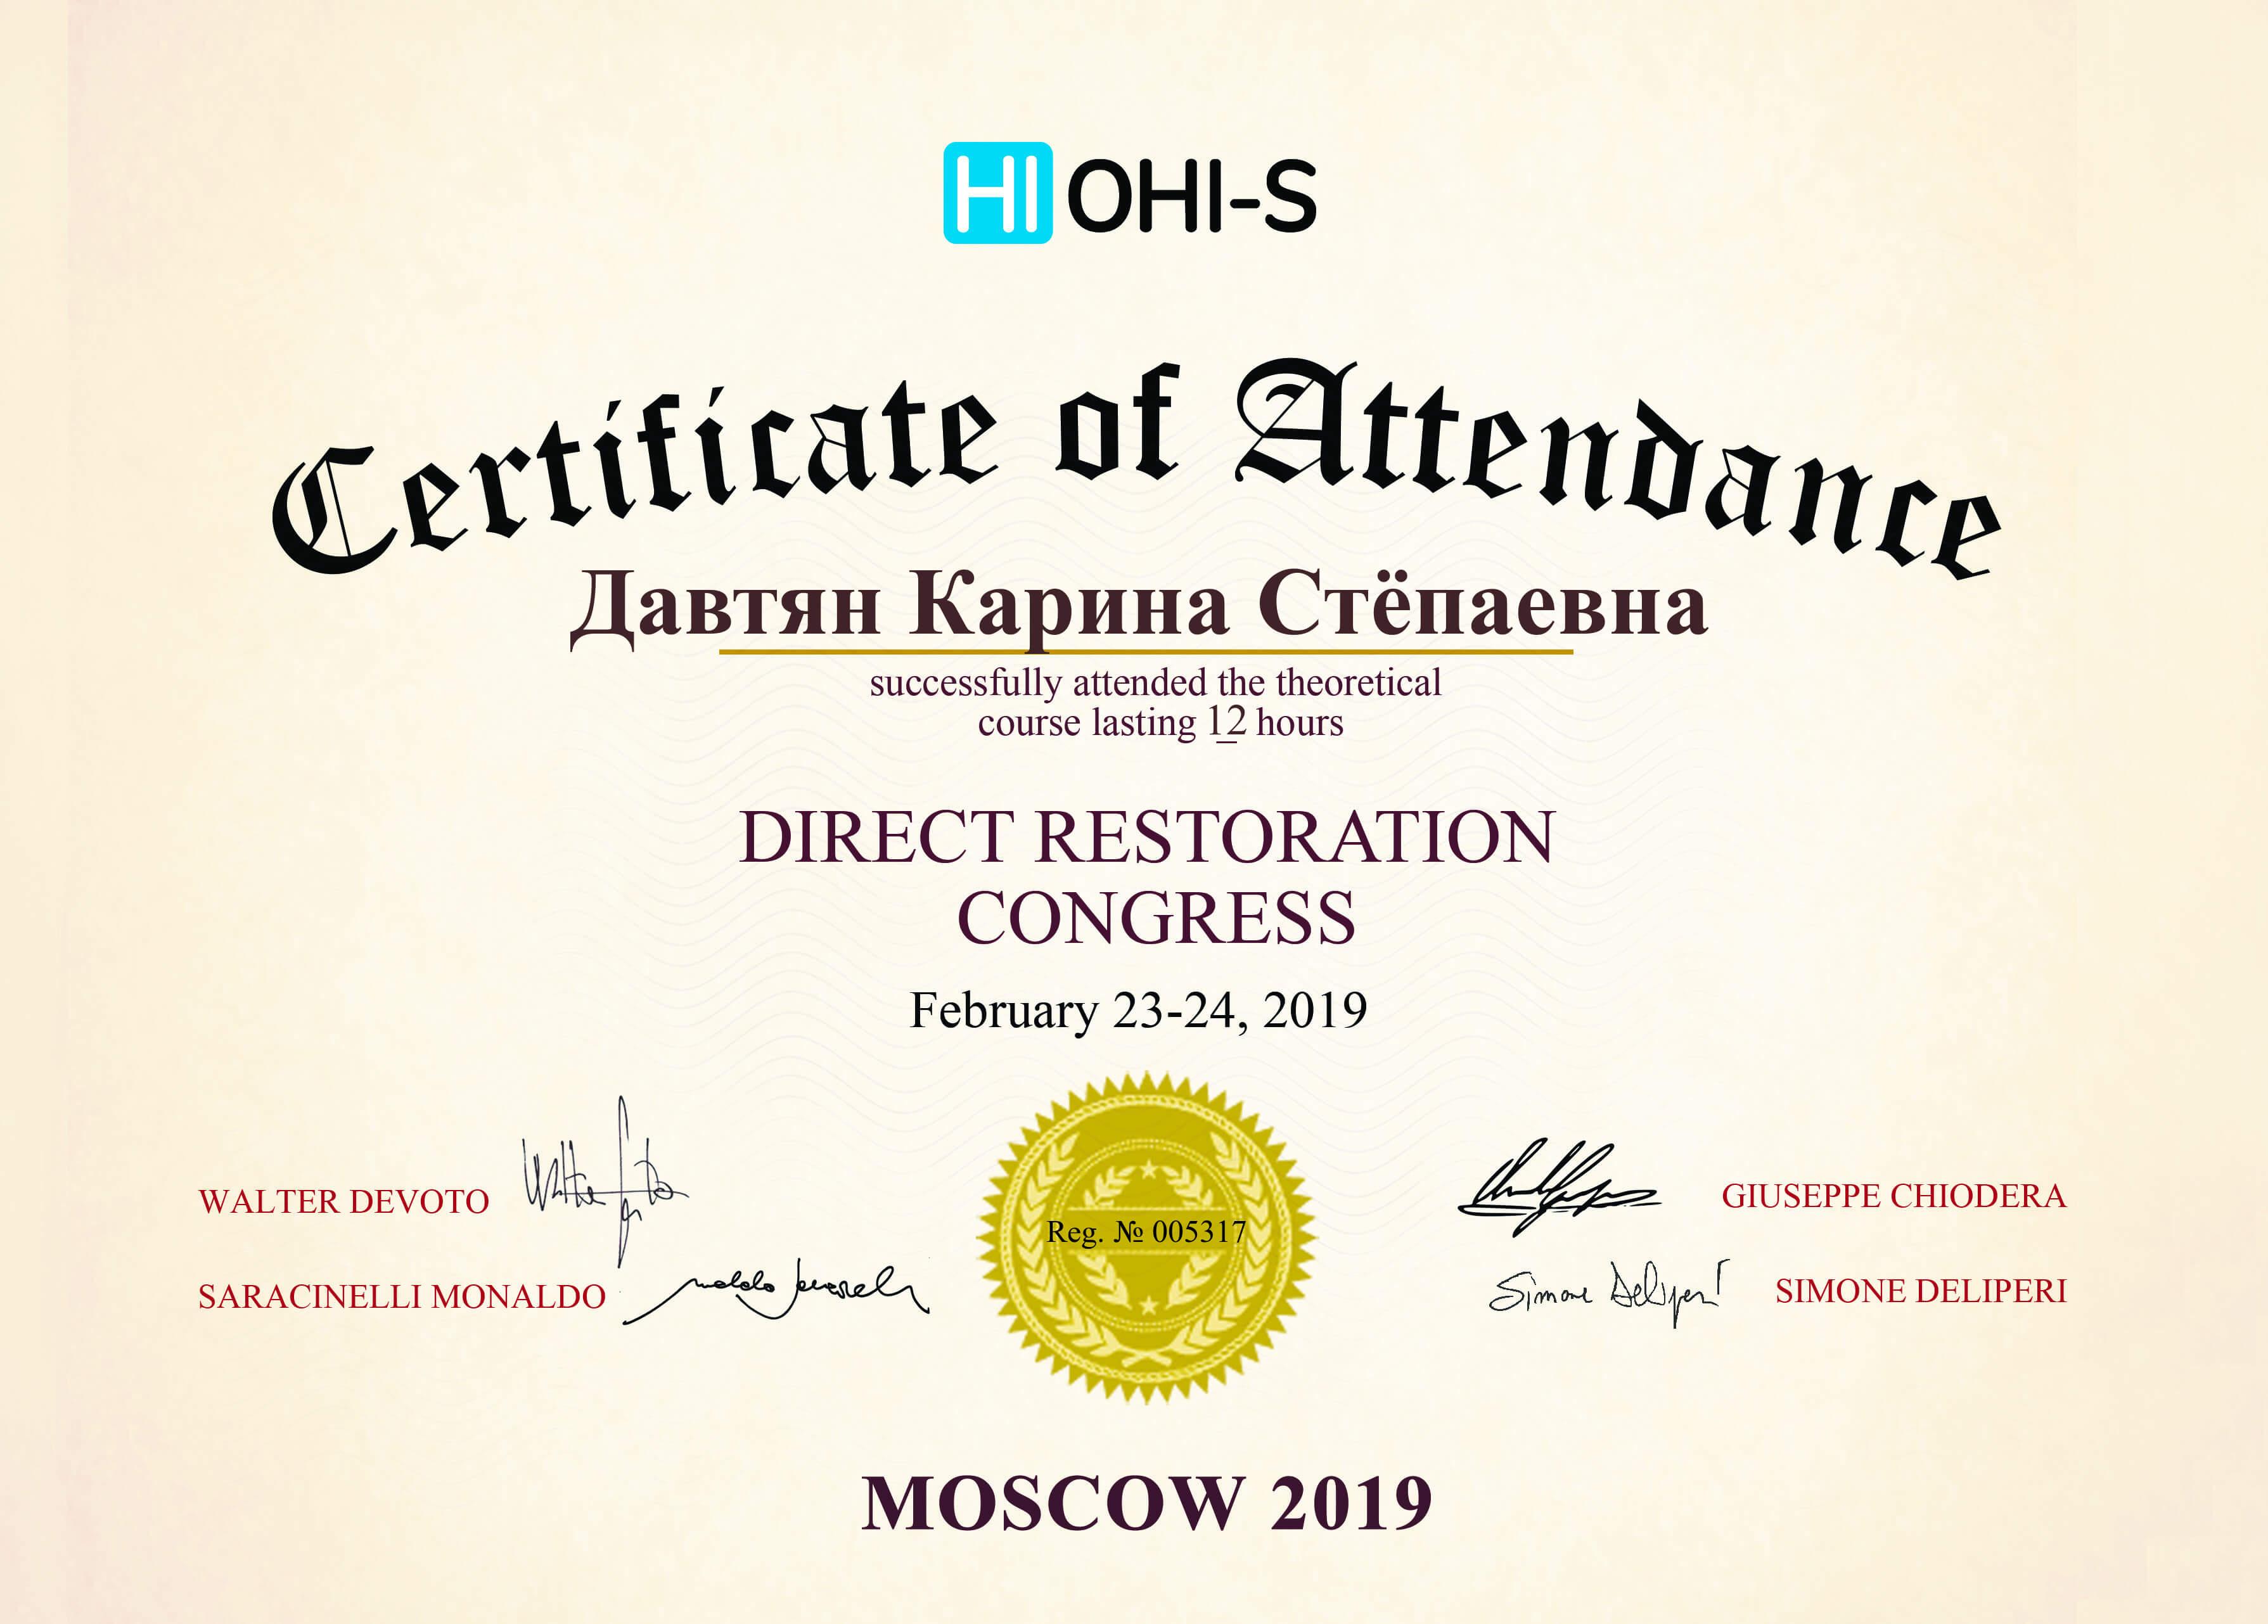 davtyan_karina_stepaevna-005317